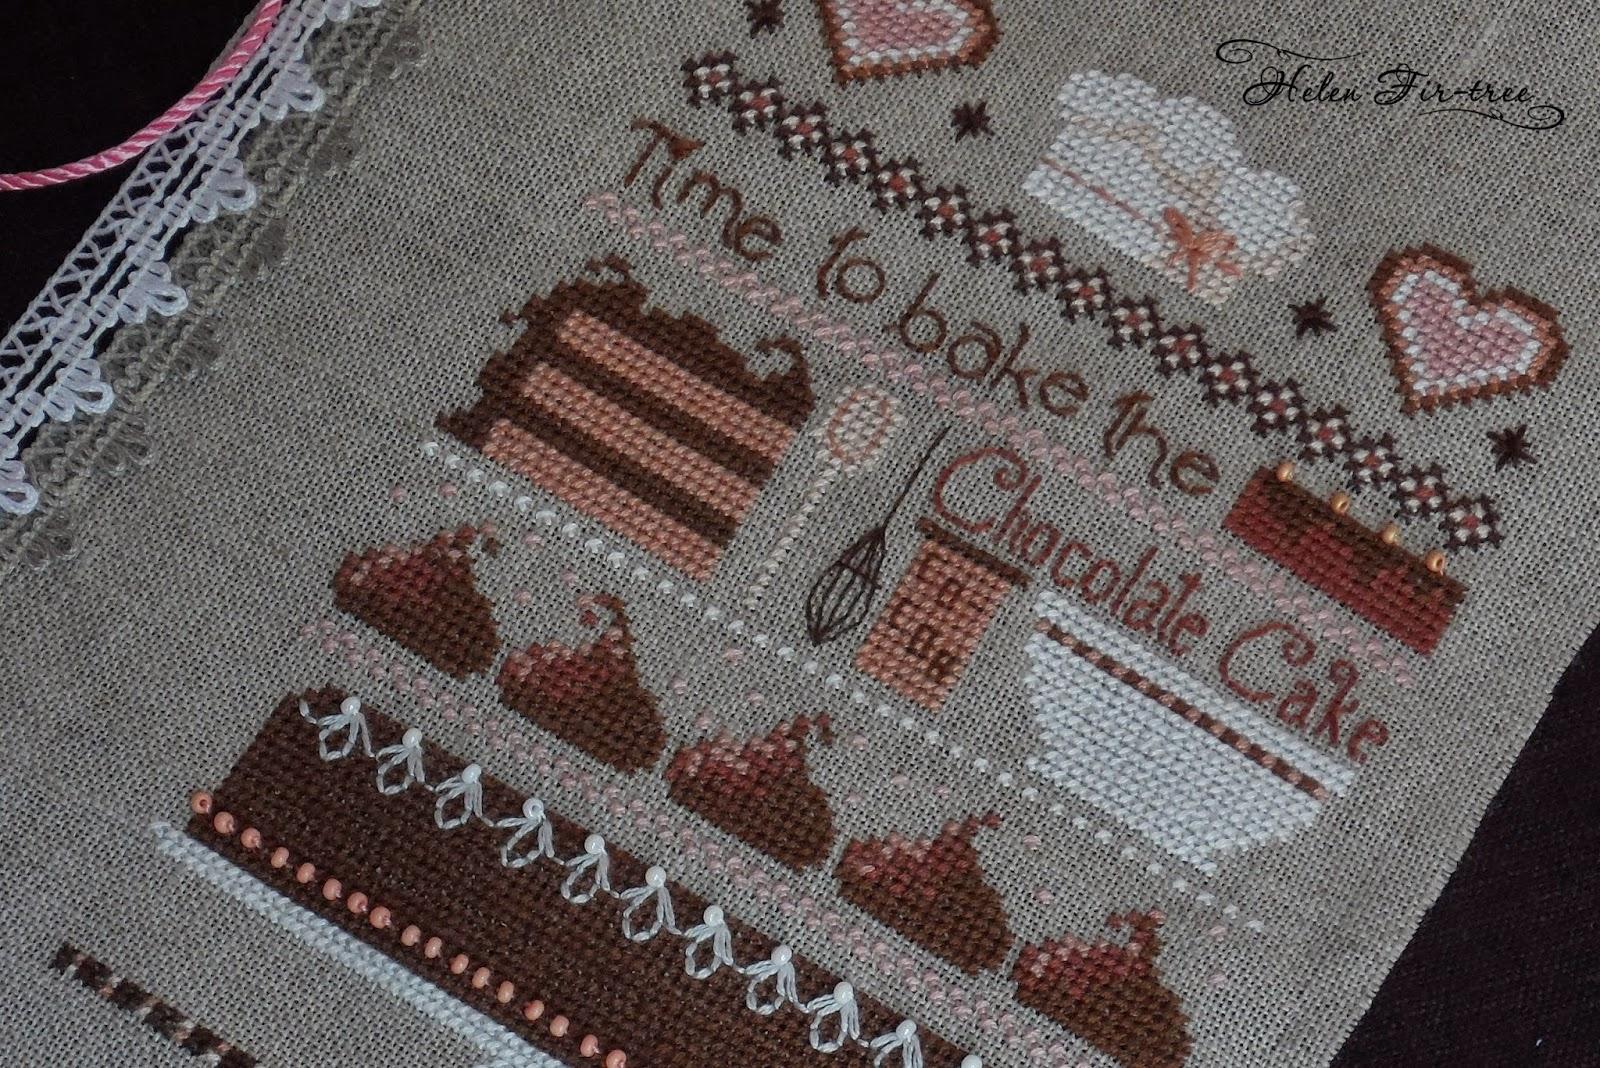 Helen Fir-tree вышивка блокнота embroidery notepad Chocolate cake sampler